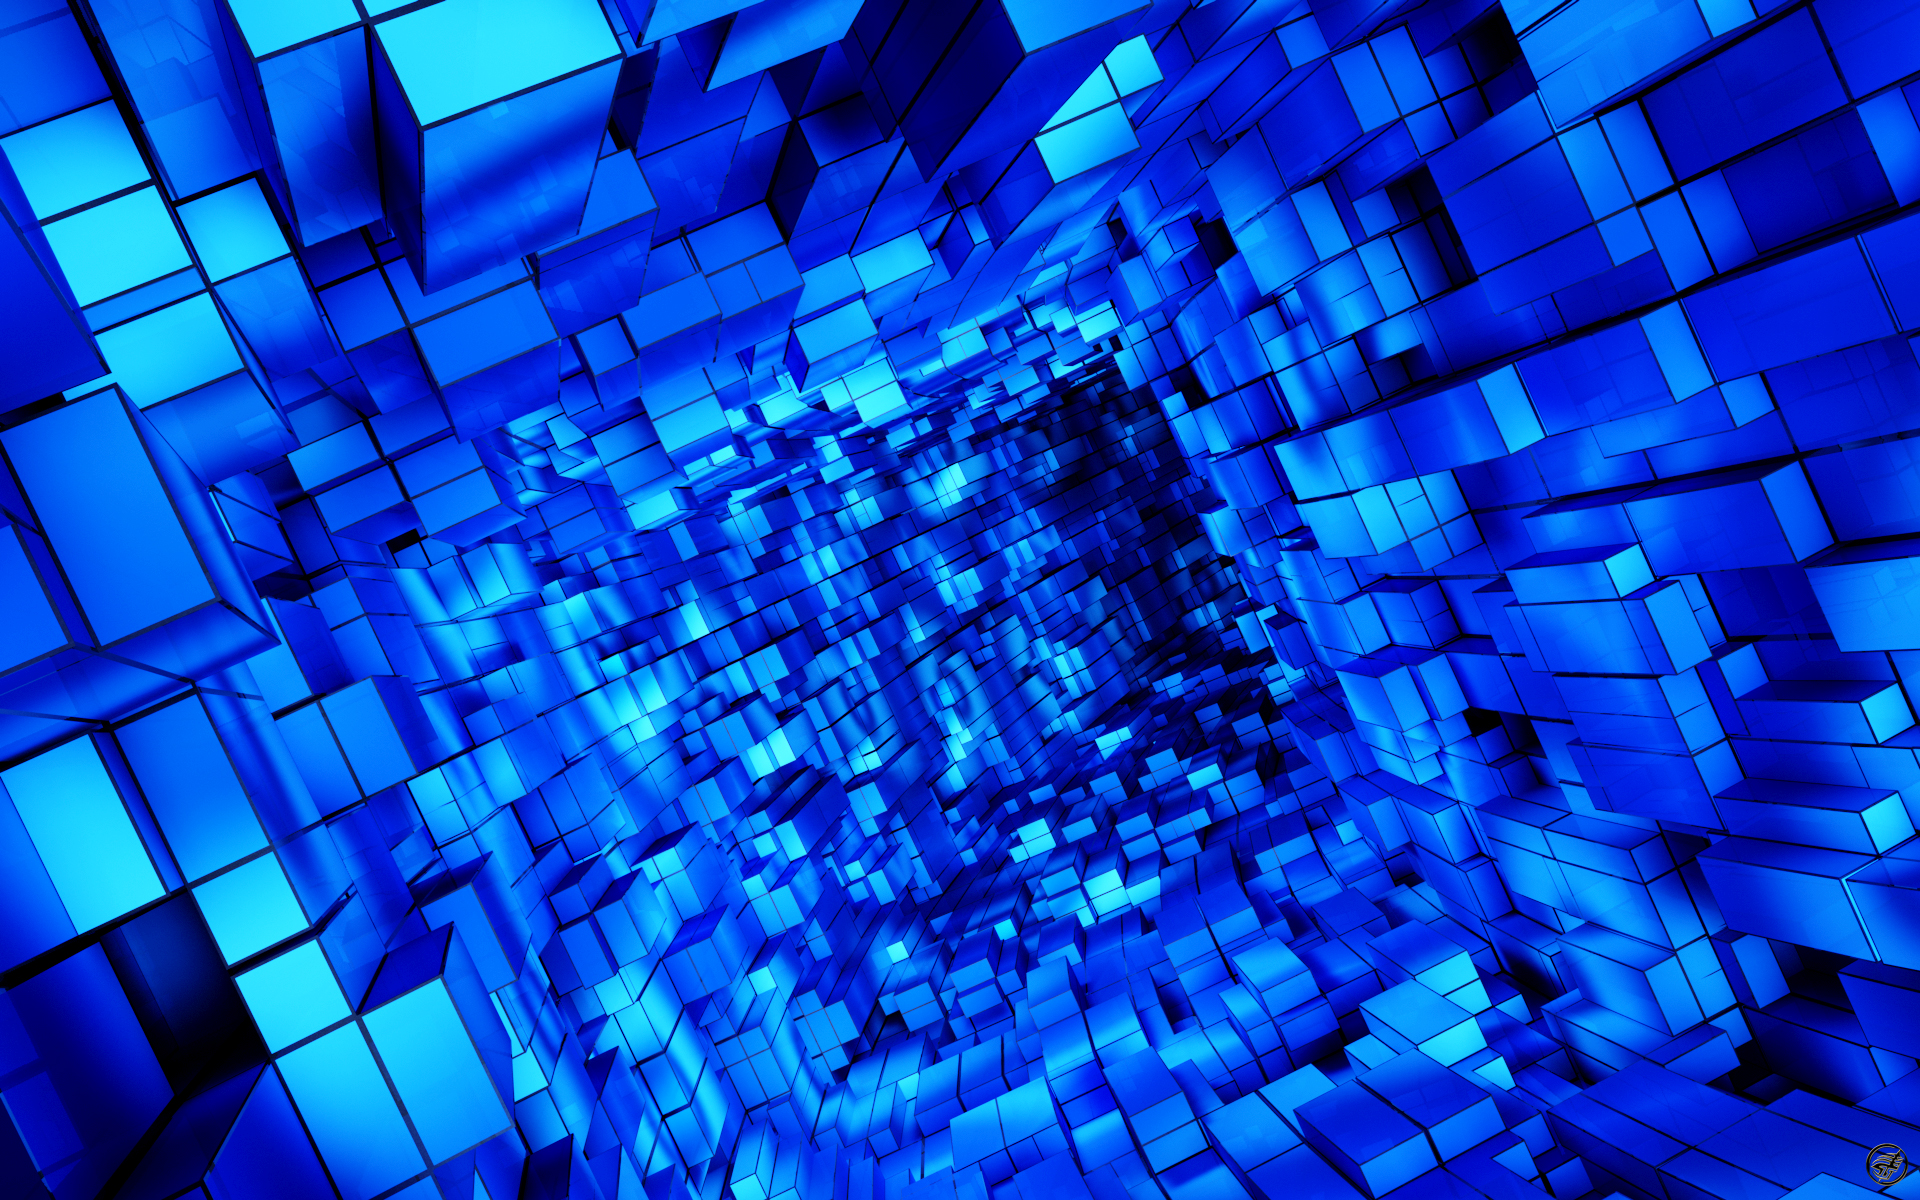 HD Wallpaper P Blue 1920x1200